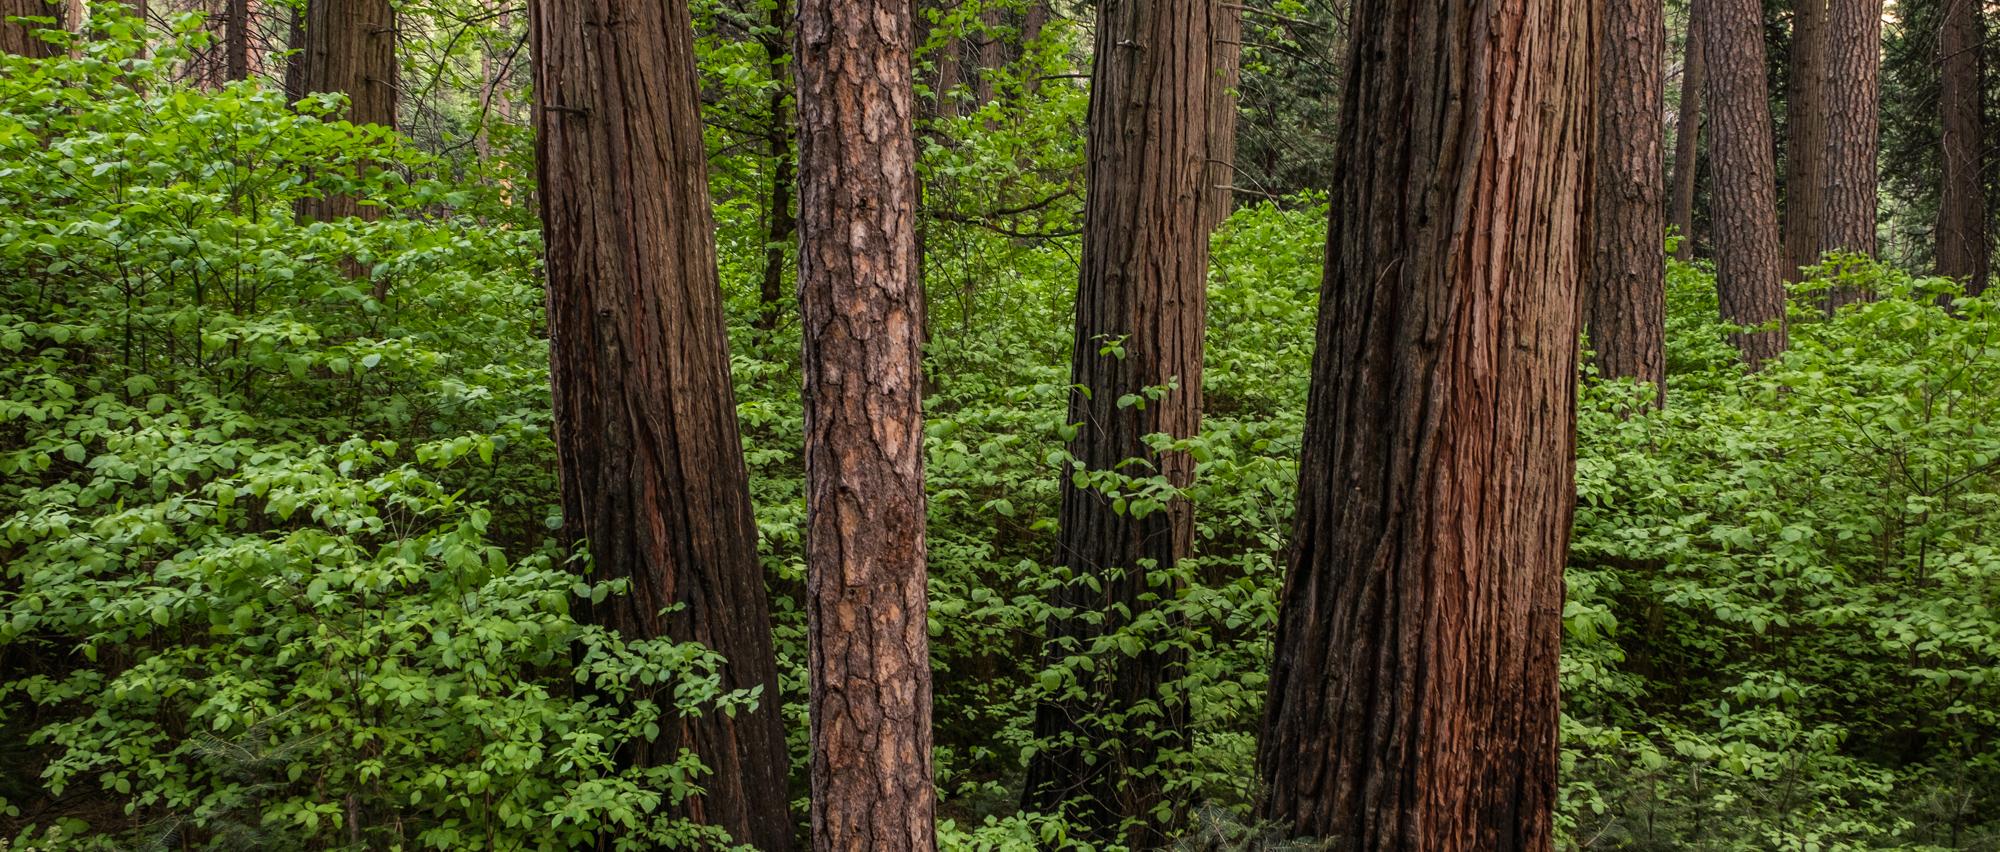 Yosemite National Park - 019.jpg